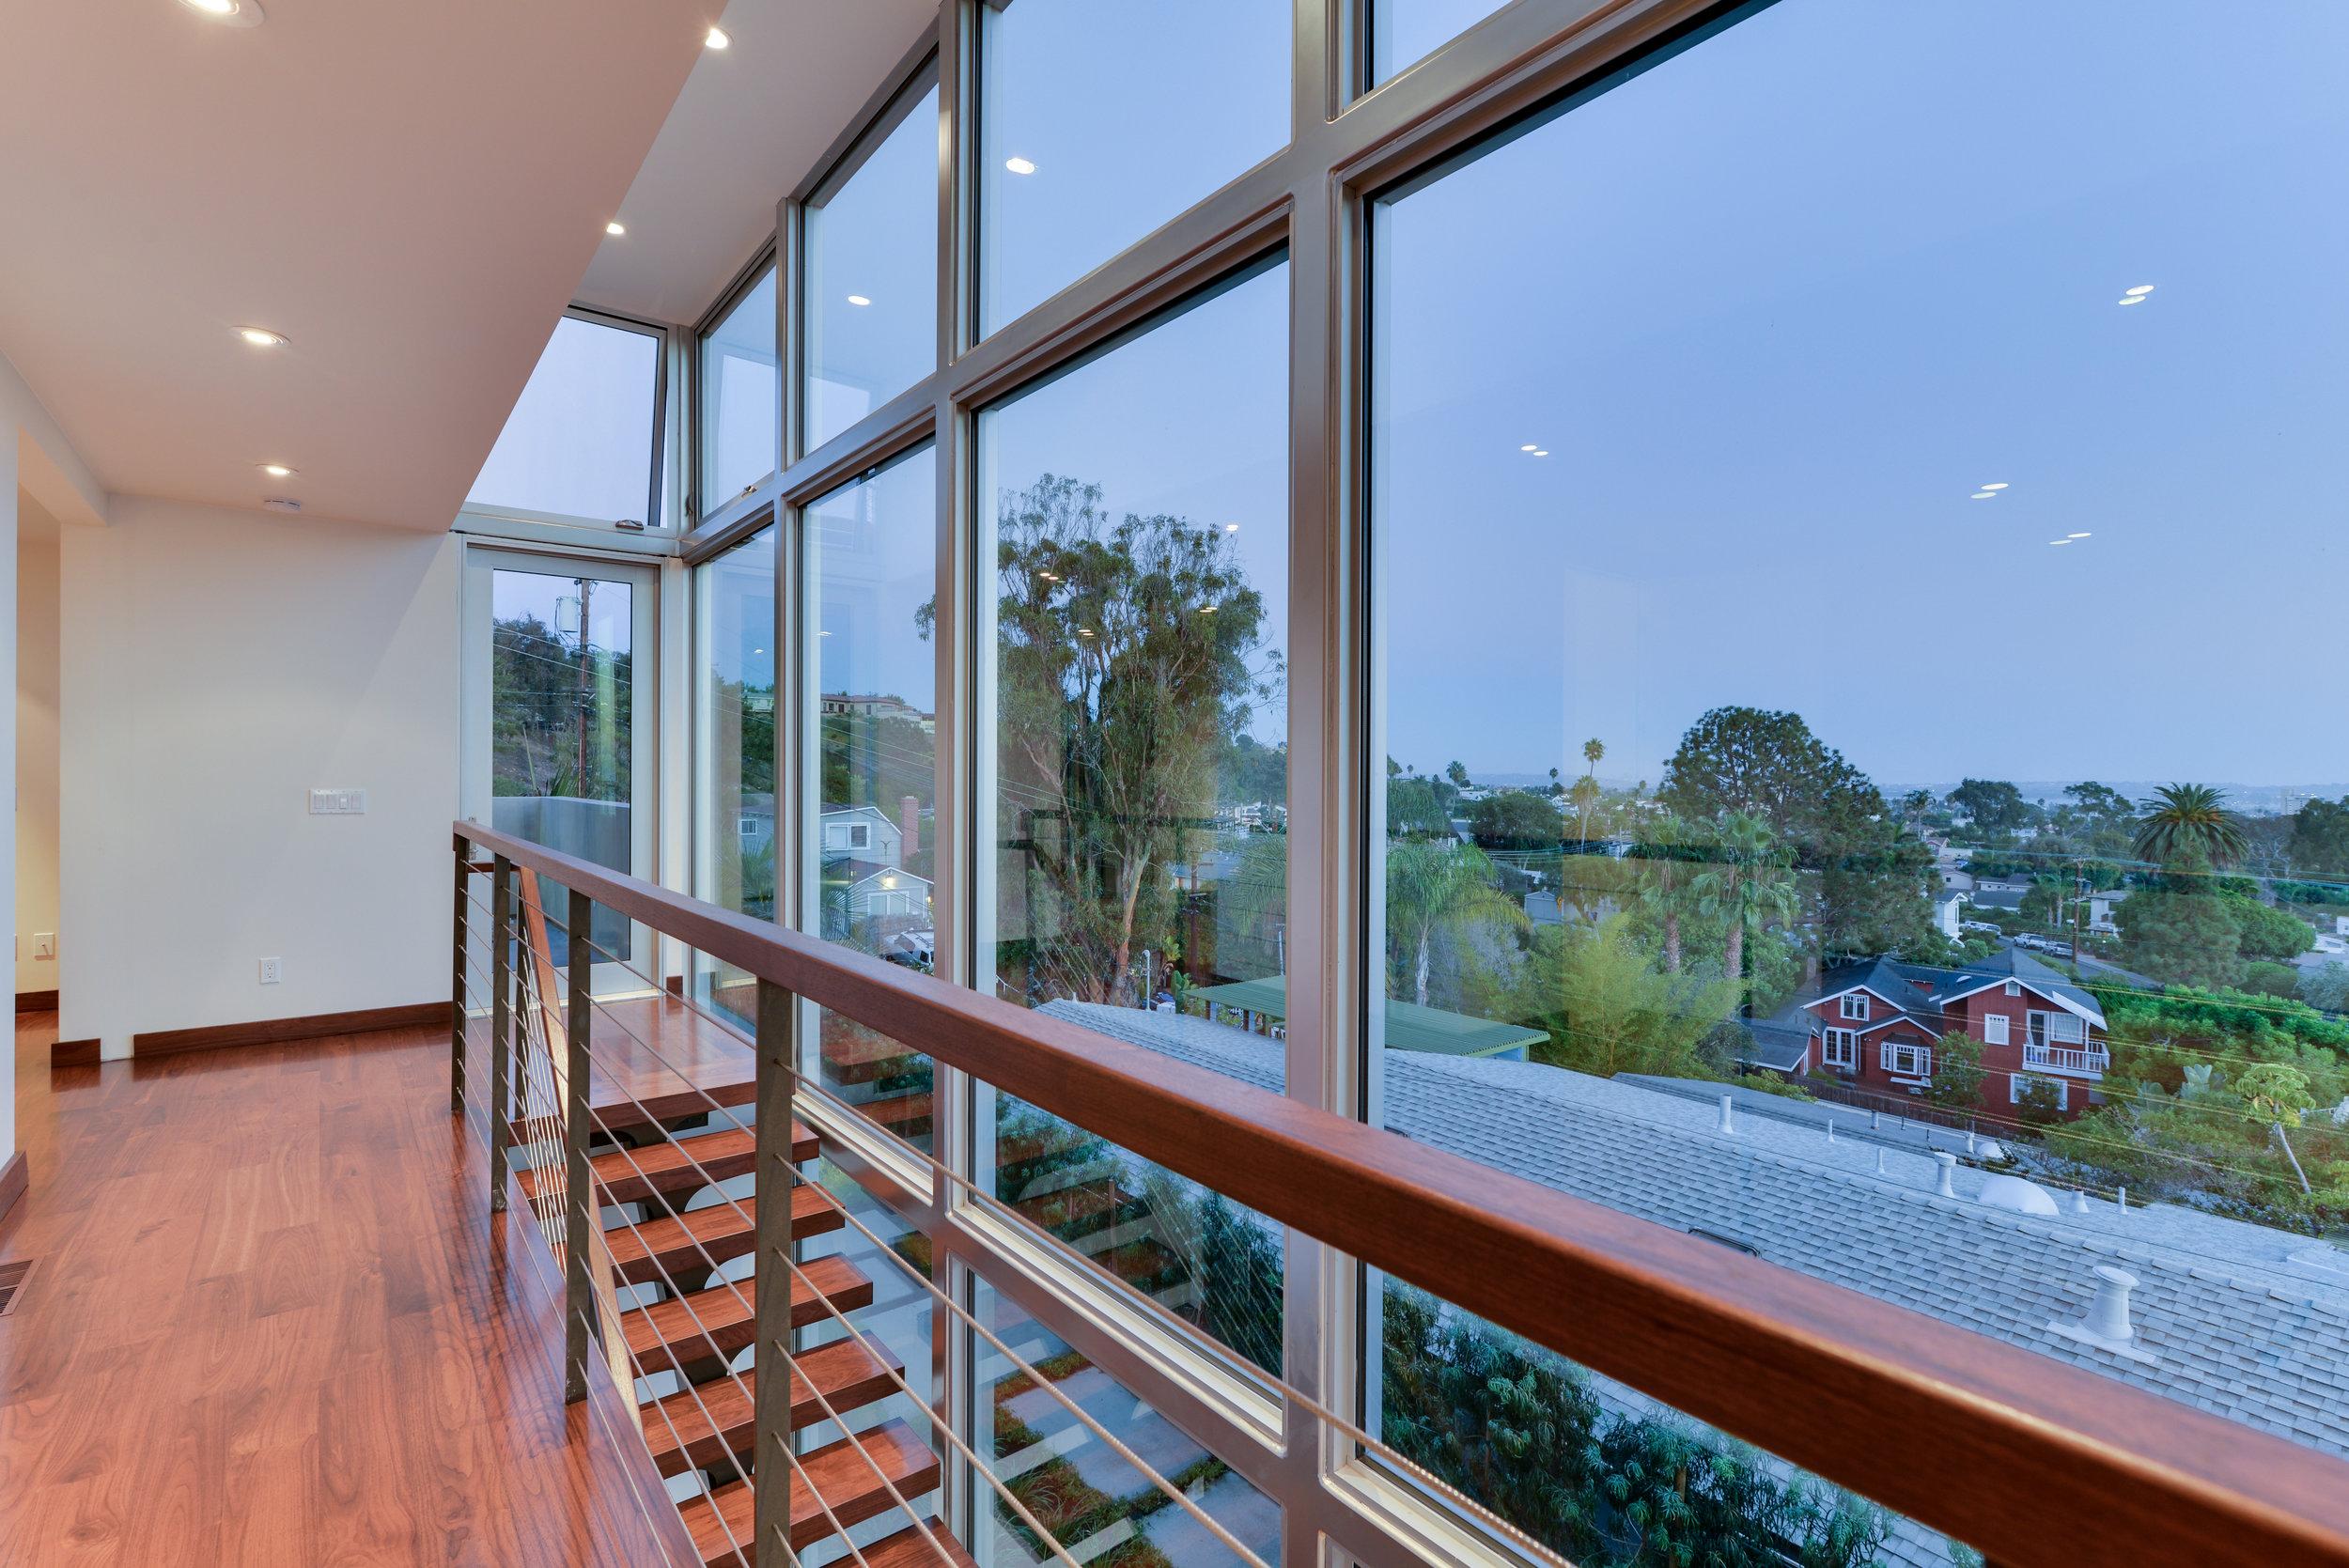 S.E.A.-Studio-Environmental-Architecture-David-Hertz-FAIA-Linda-Rosa-House-La-Jolla-San-Diego-sustainable-regenerative-restorative-design-modern-residential-mindful-garden-panoramic-ocean-view-open-concept-california-dream-12.jpg